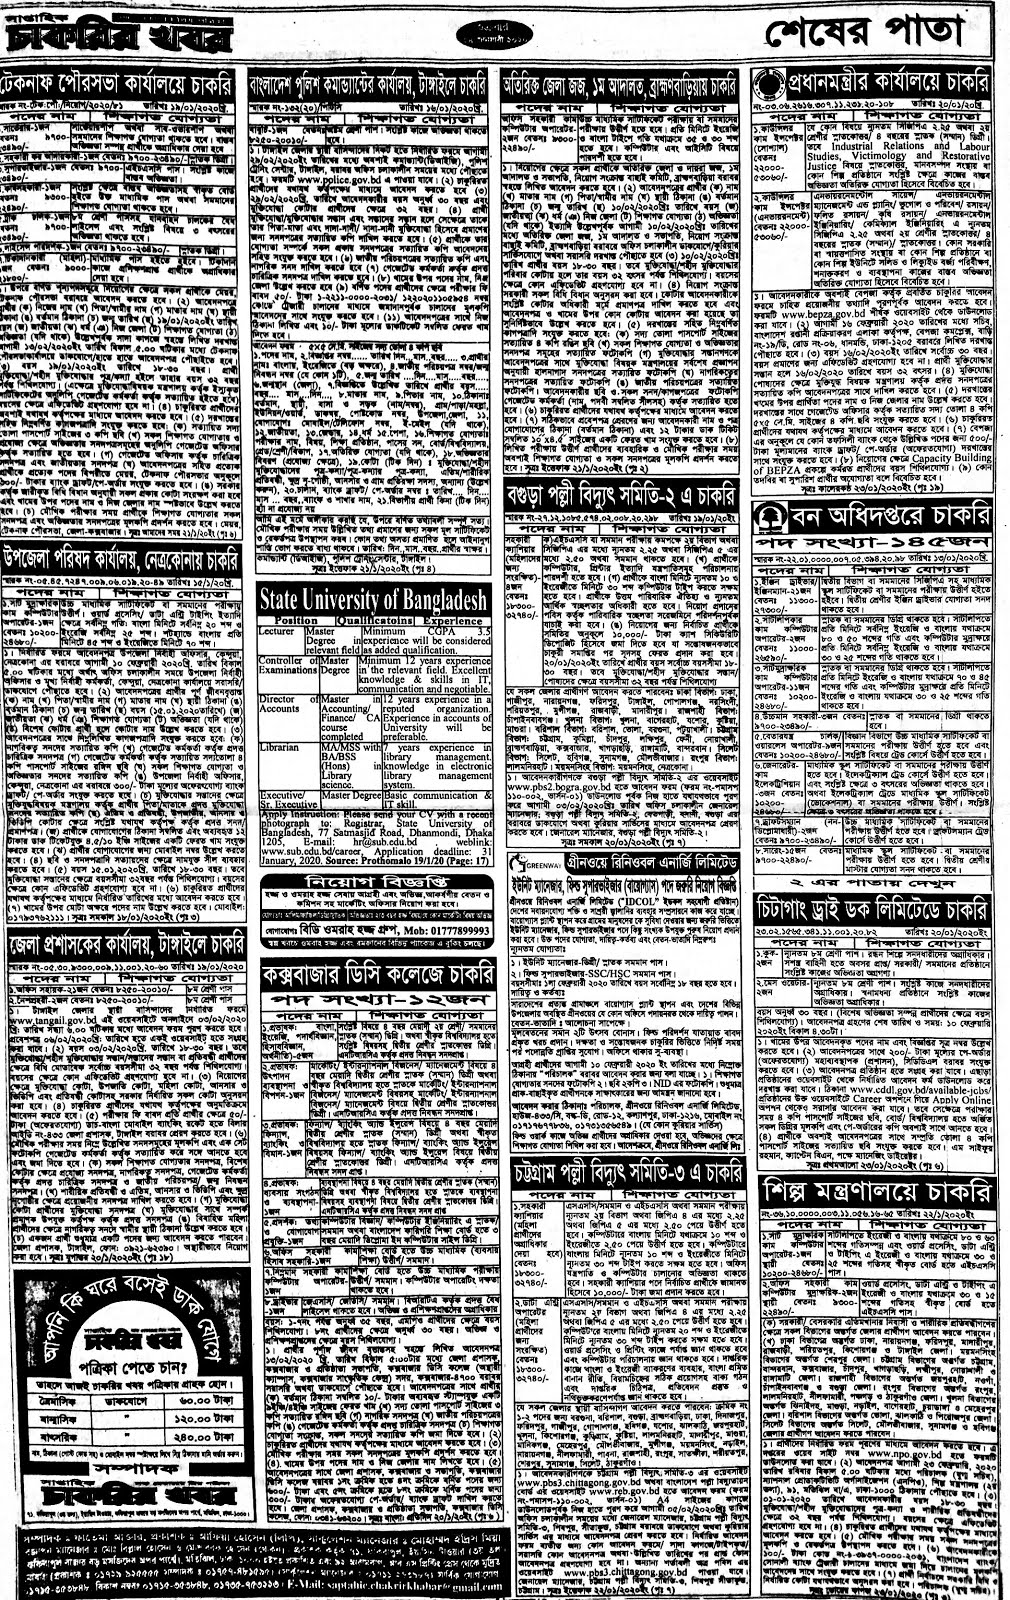 Saptahik Chakrir Khobor Newspaper 24 January 2020 সাপ্তাহিক চাকরির খবর পত্রিকা pdf Download  desk  January 24, 2020 Jobs Newspaper